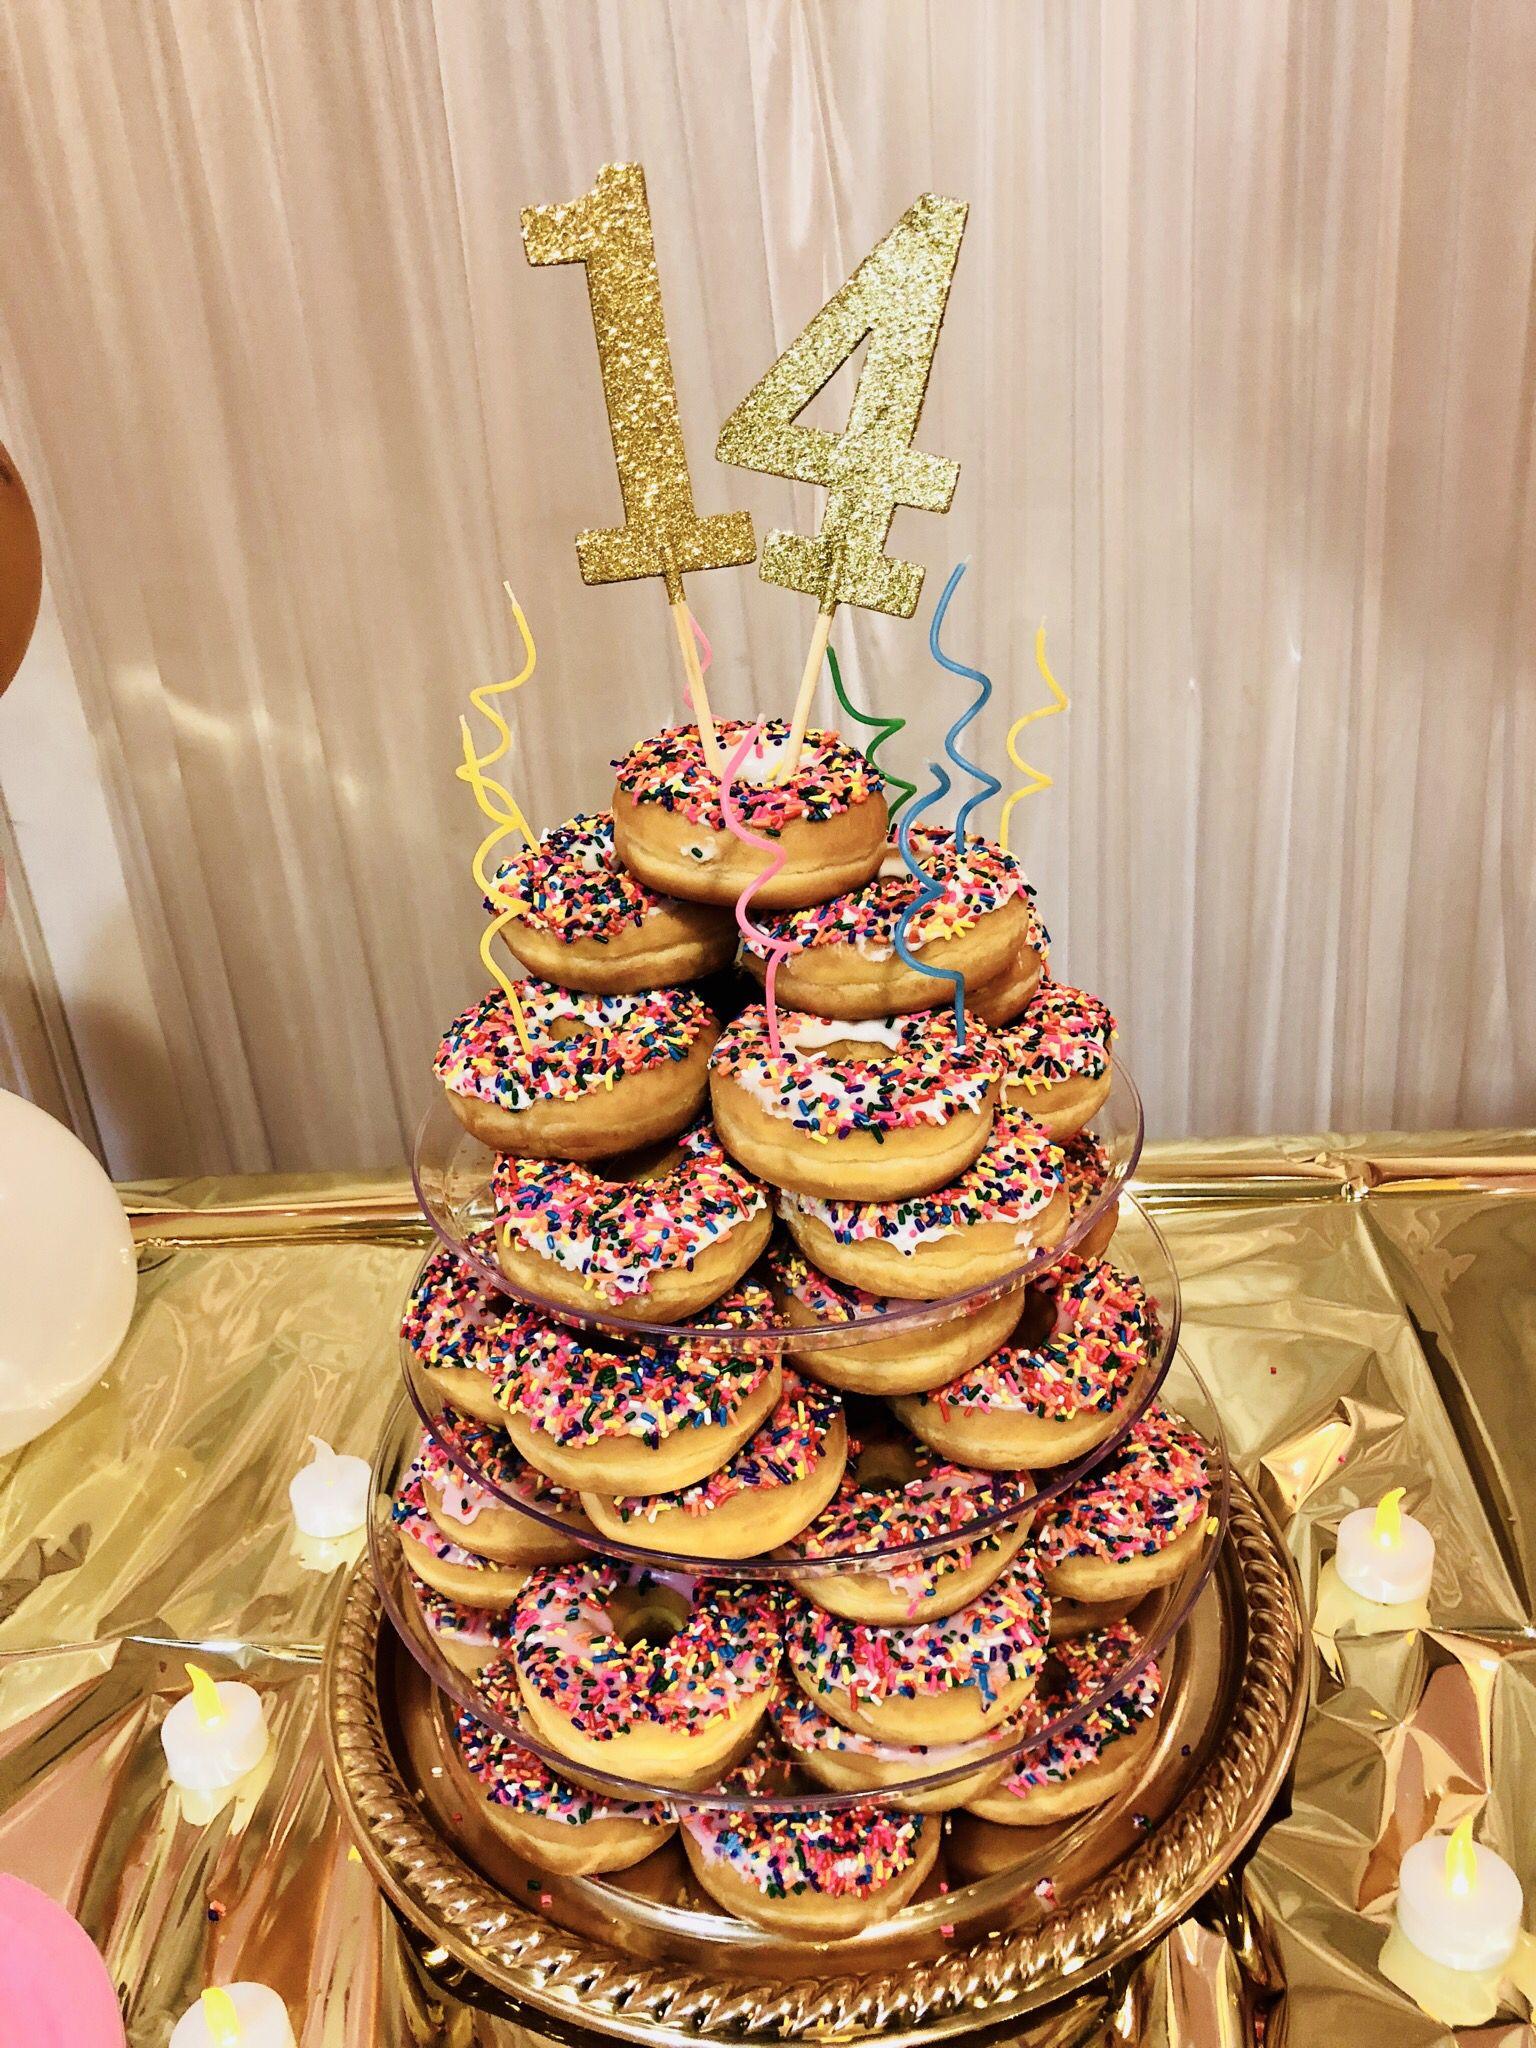 Wondrous Donut Birthday Cake Easy With Images Birthday Donuts Donut Funny Birthday Cards Online Alyptdamsfinfo